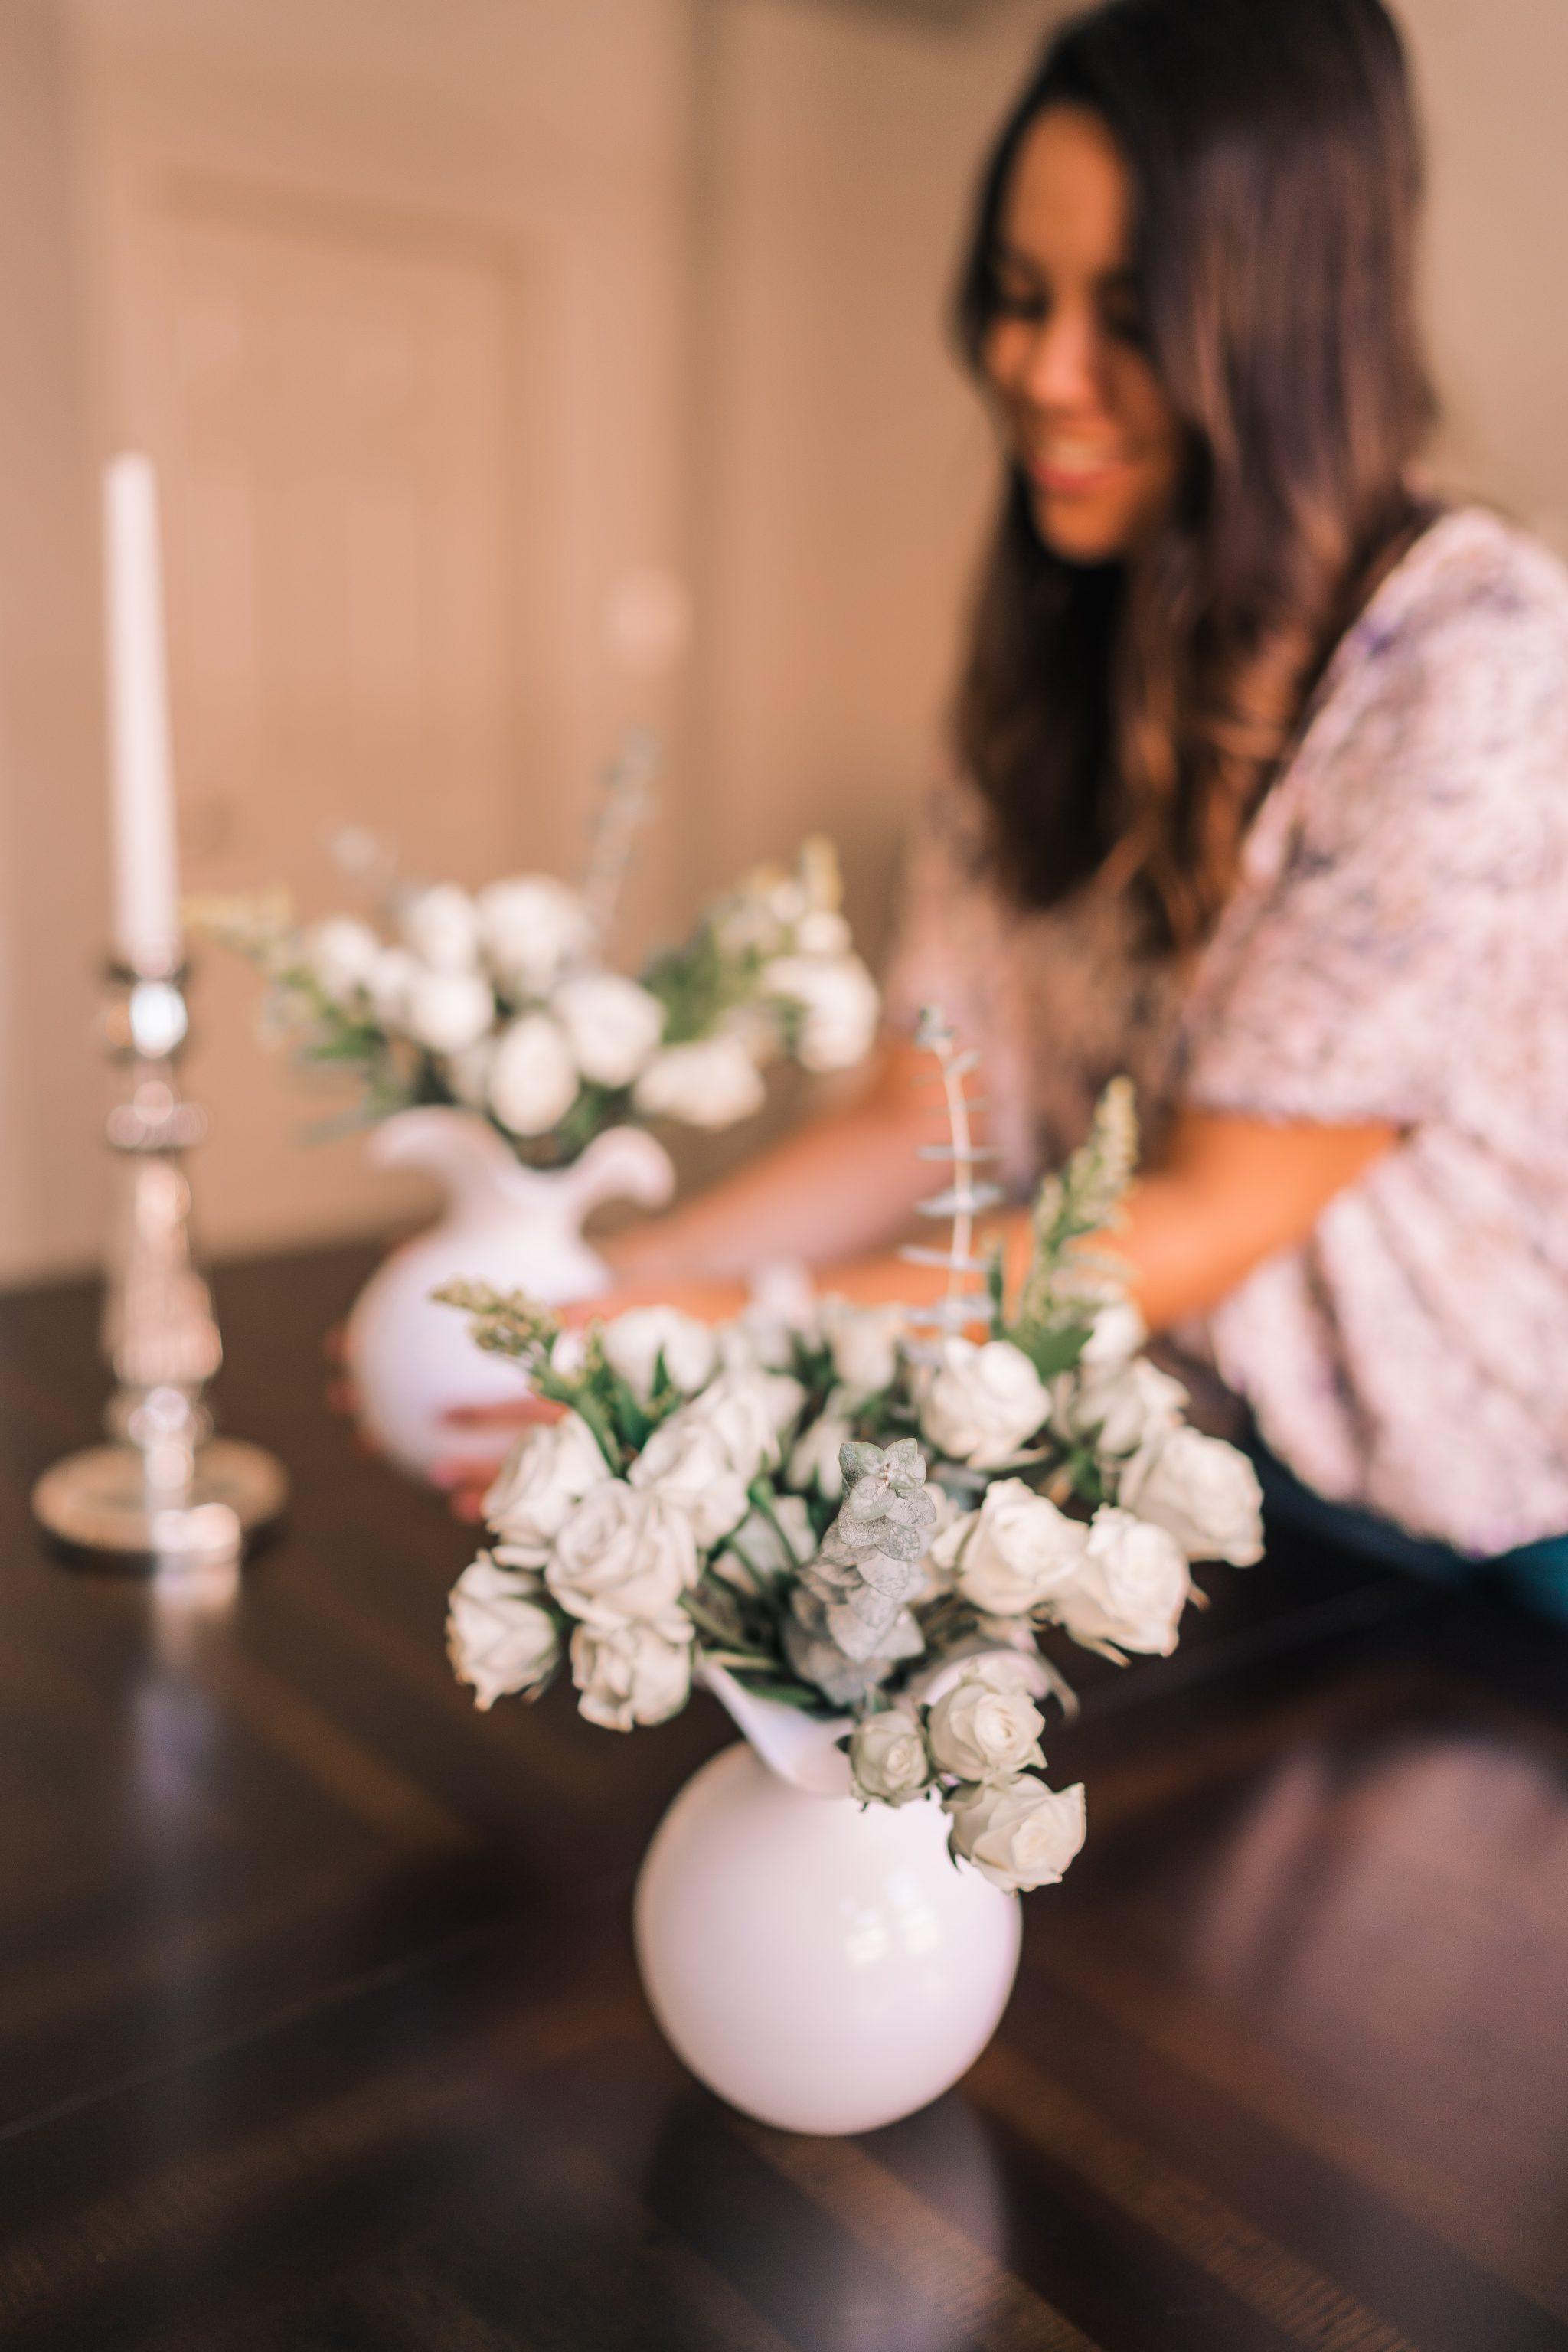 Budget-friendly at home flower arrangements